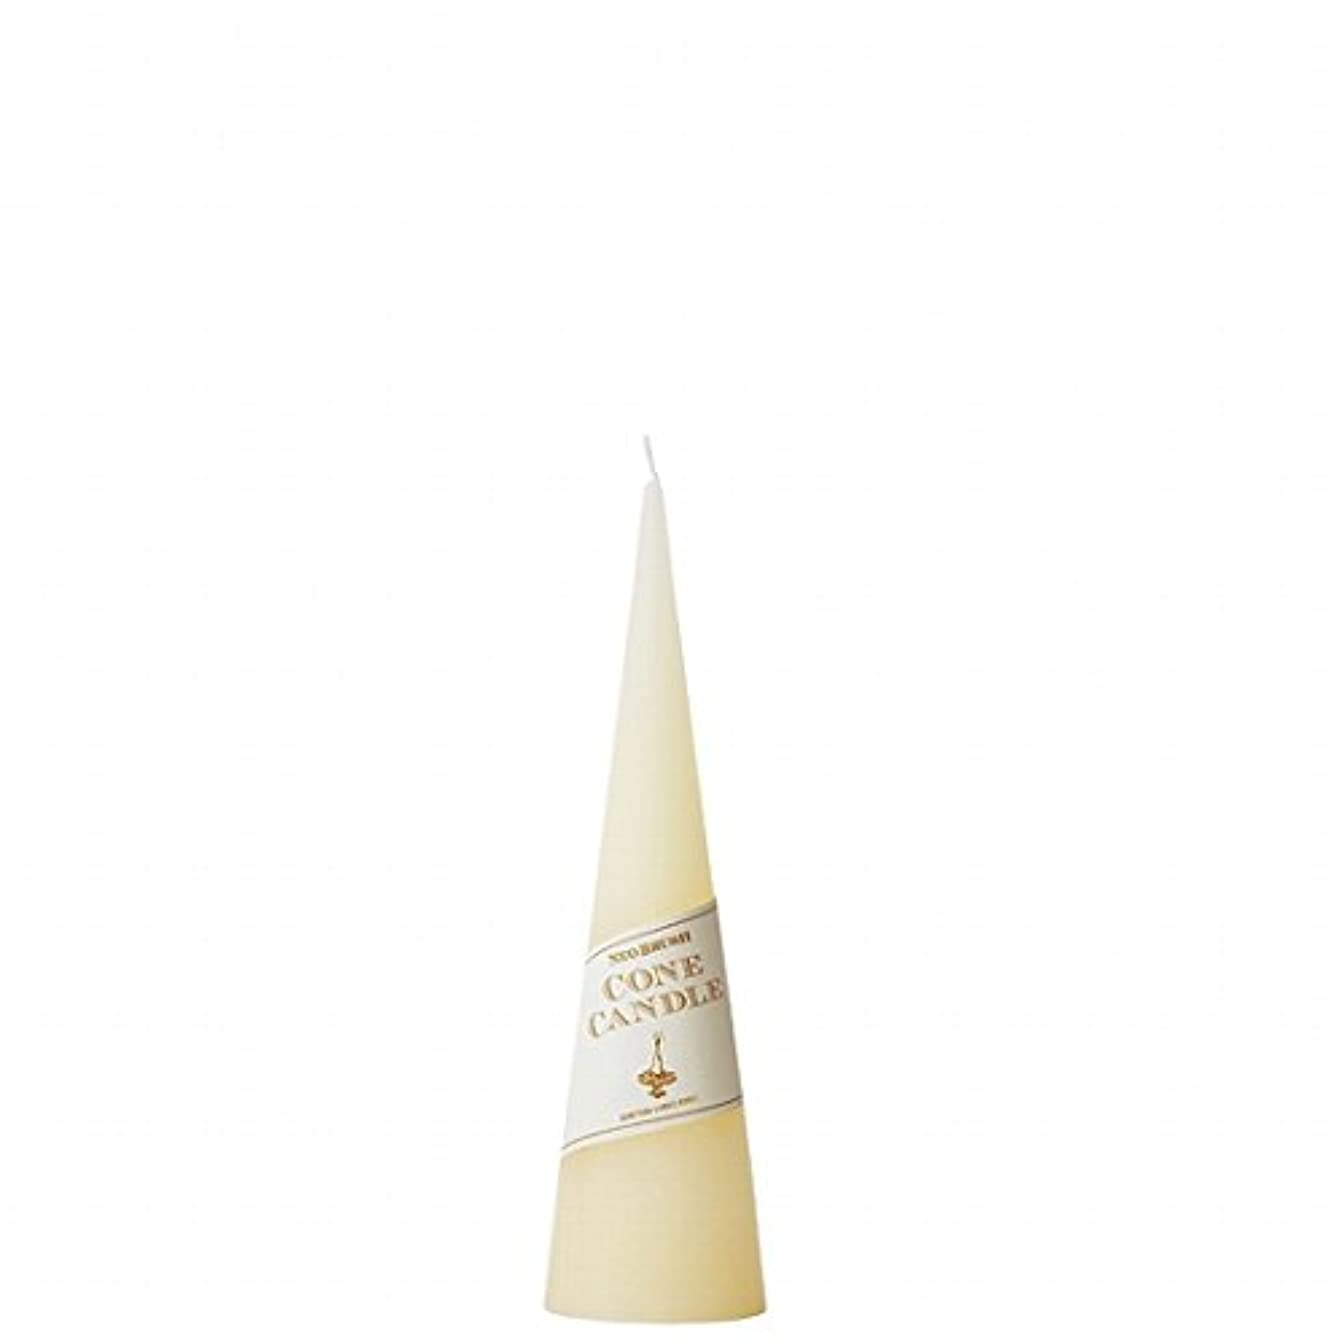 kameyama candle(カメヤマキャンドル) ネオブラッシュコーン 180 キャンドル 「 アイボリー 」(A9750010IV)